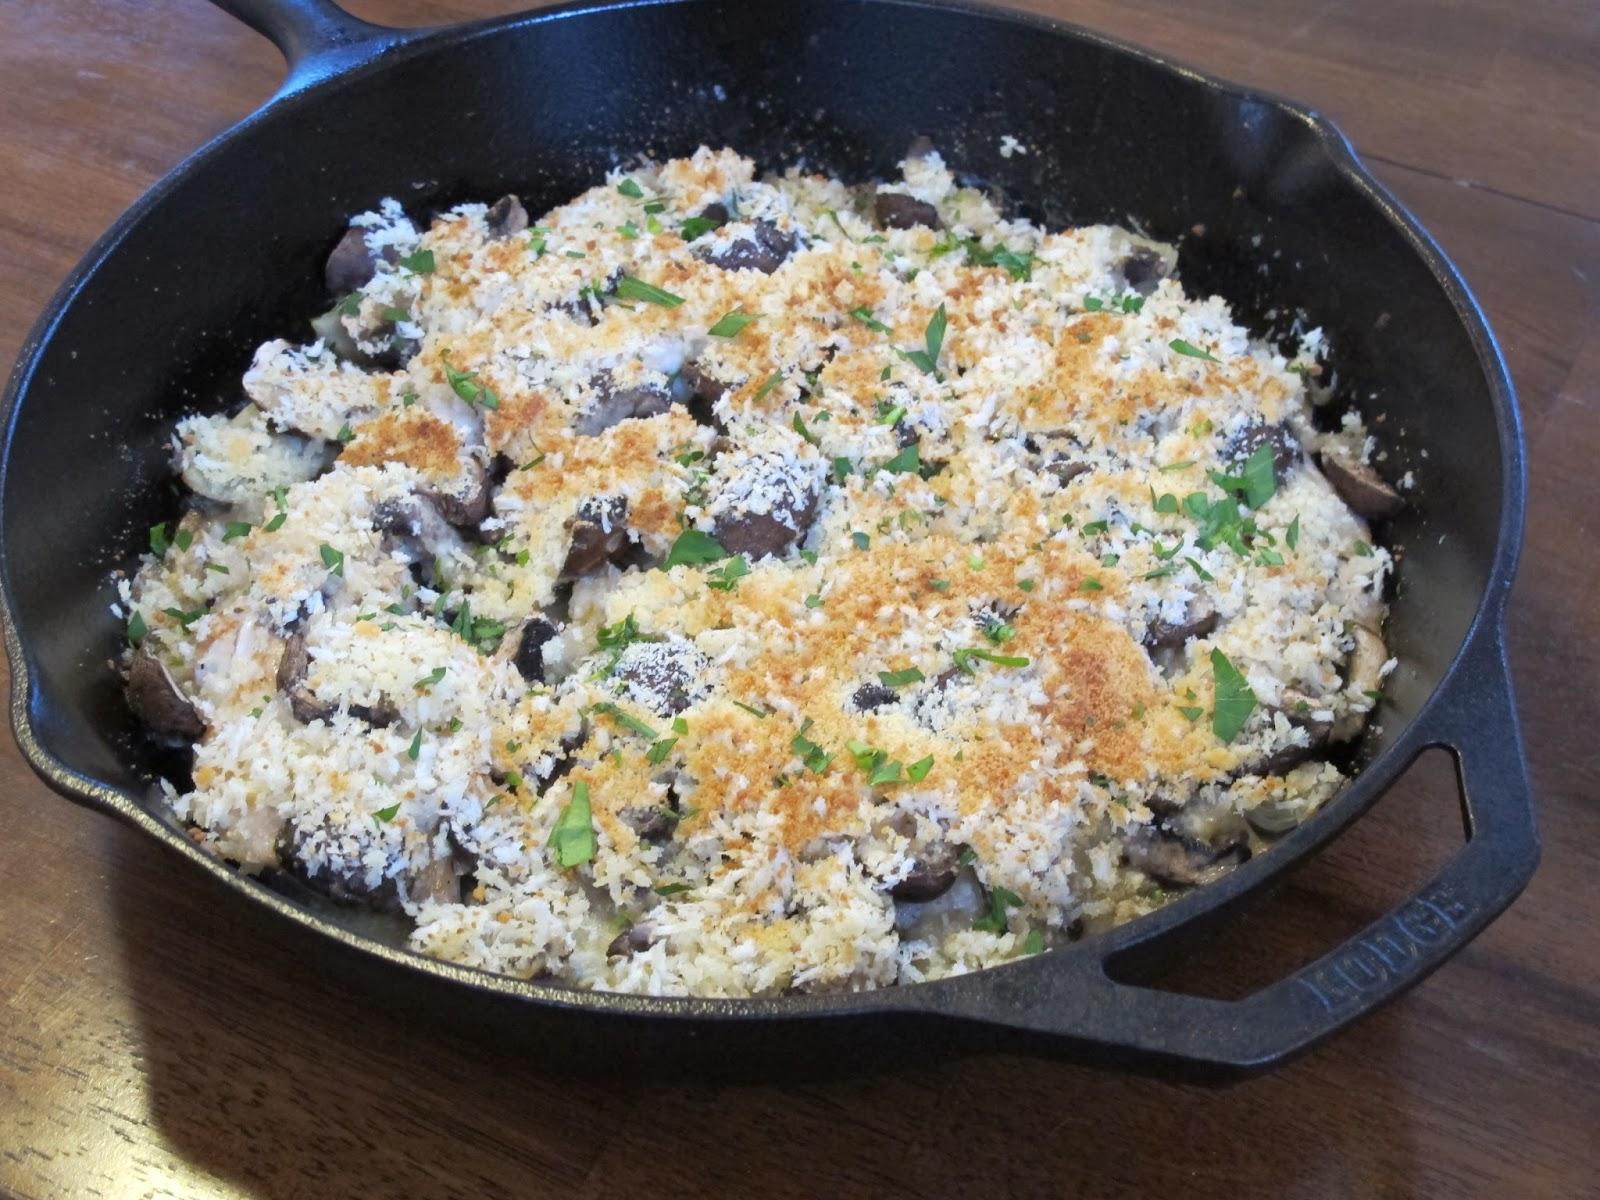 Creamy Chicken, Artichoke, & Mushroom Casserole